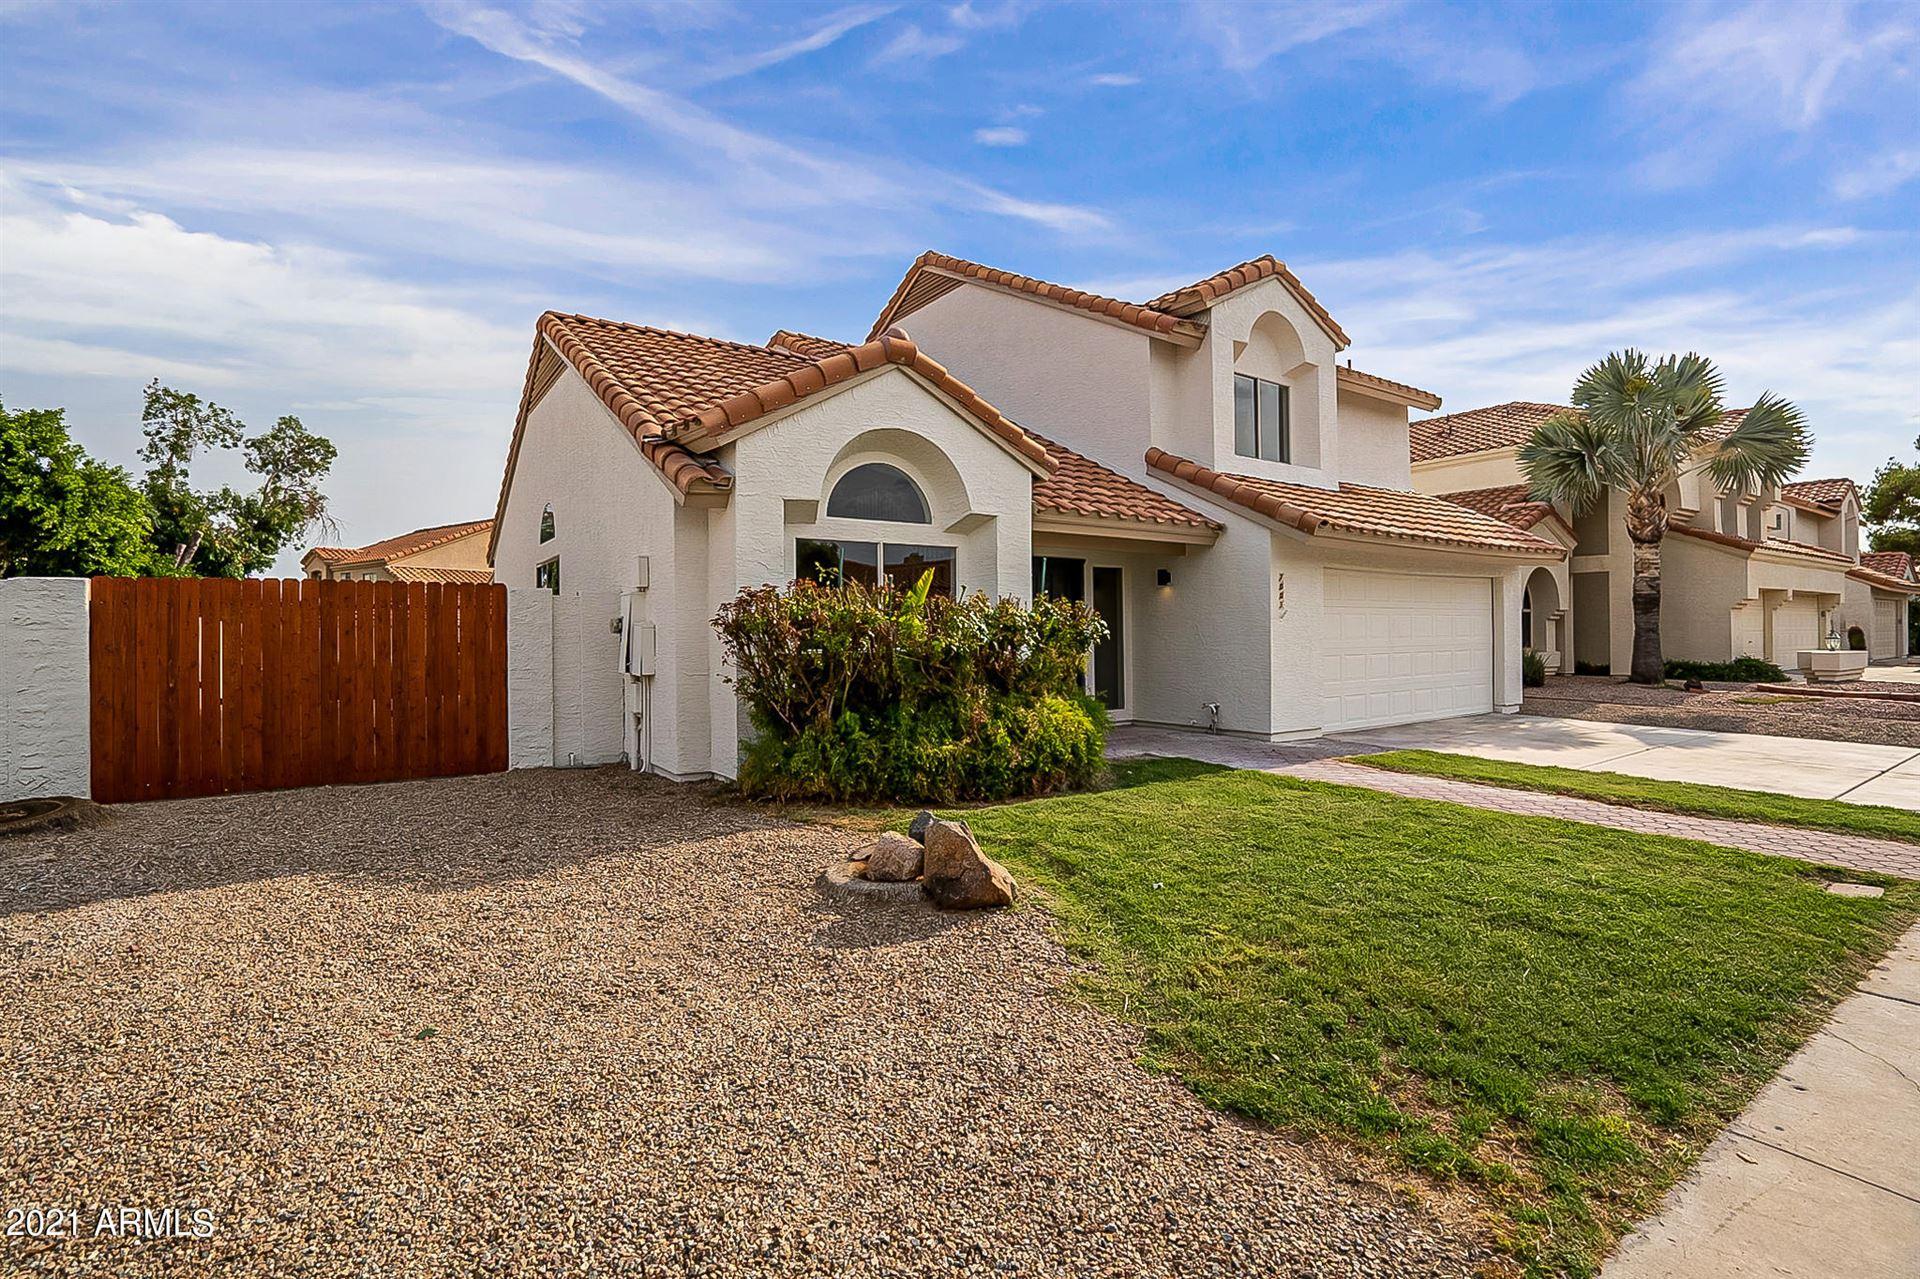 Photo of 7001 W MARCO POLO Road, Glendale, AZ 85308 (MLS # 6268912)